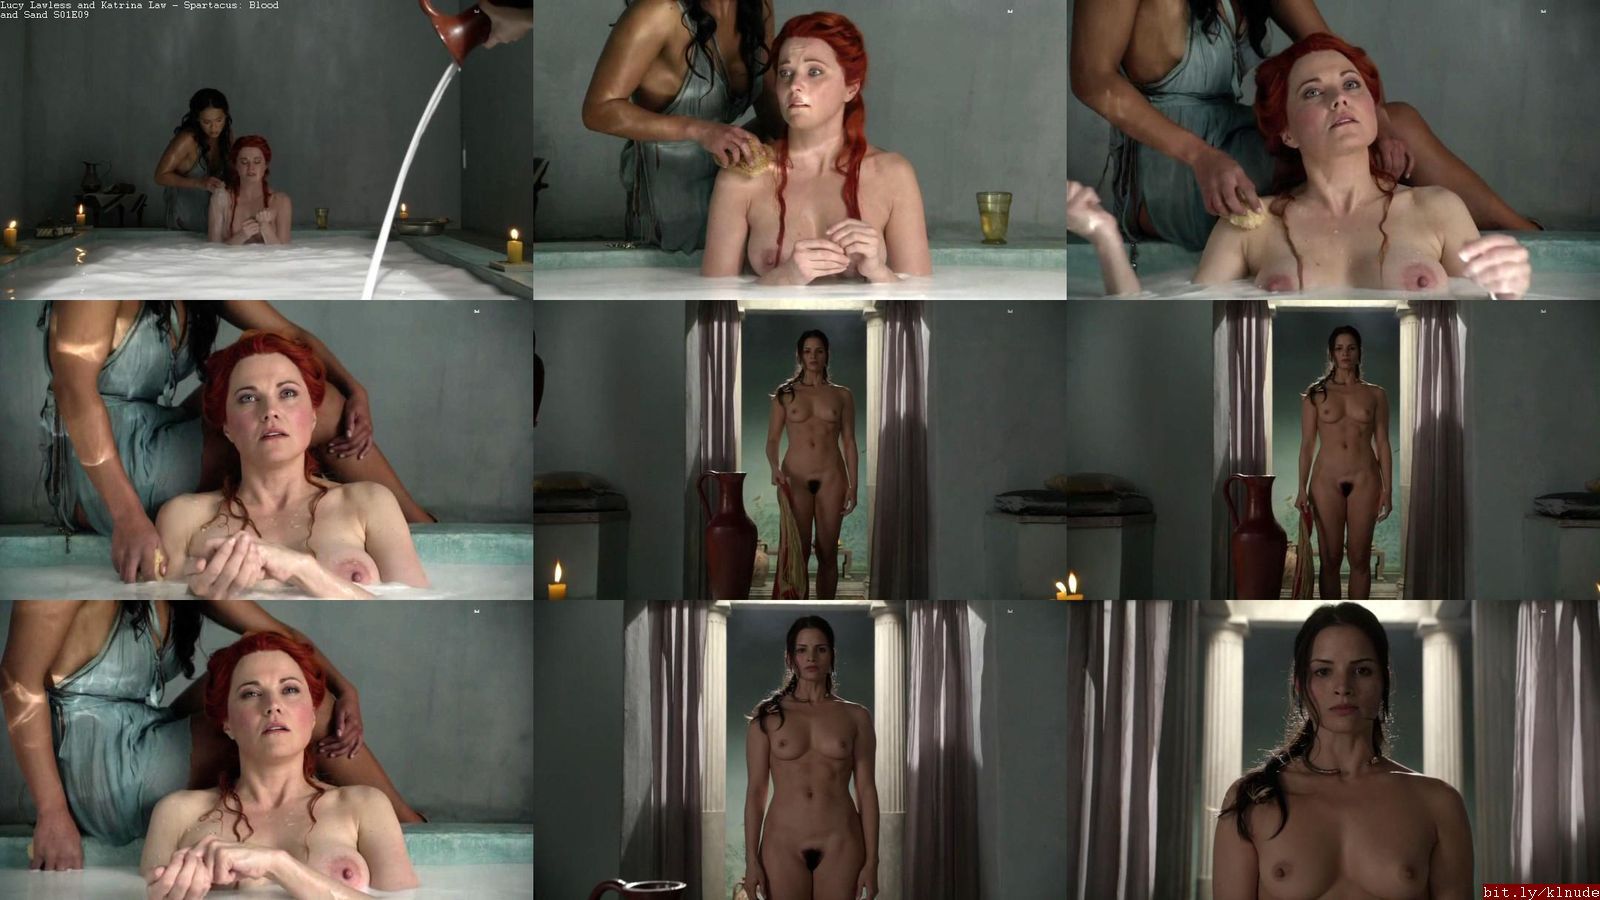 Dancing semi naked in mirror - 5 5